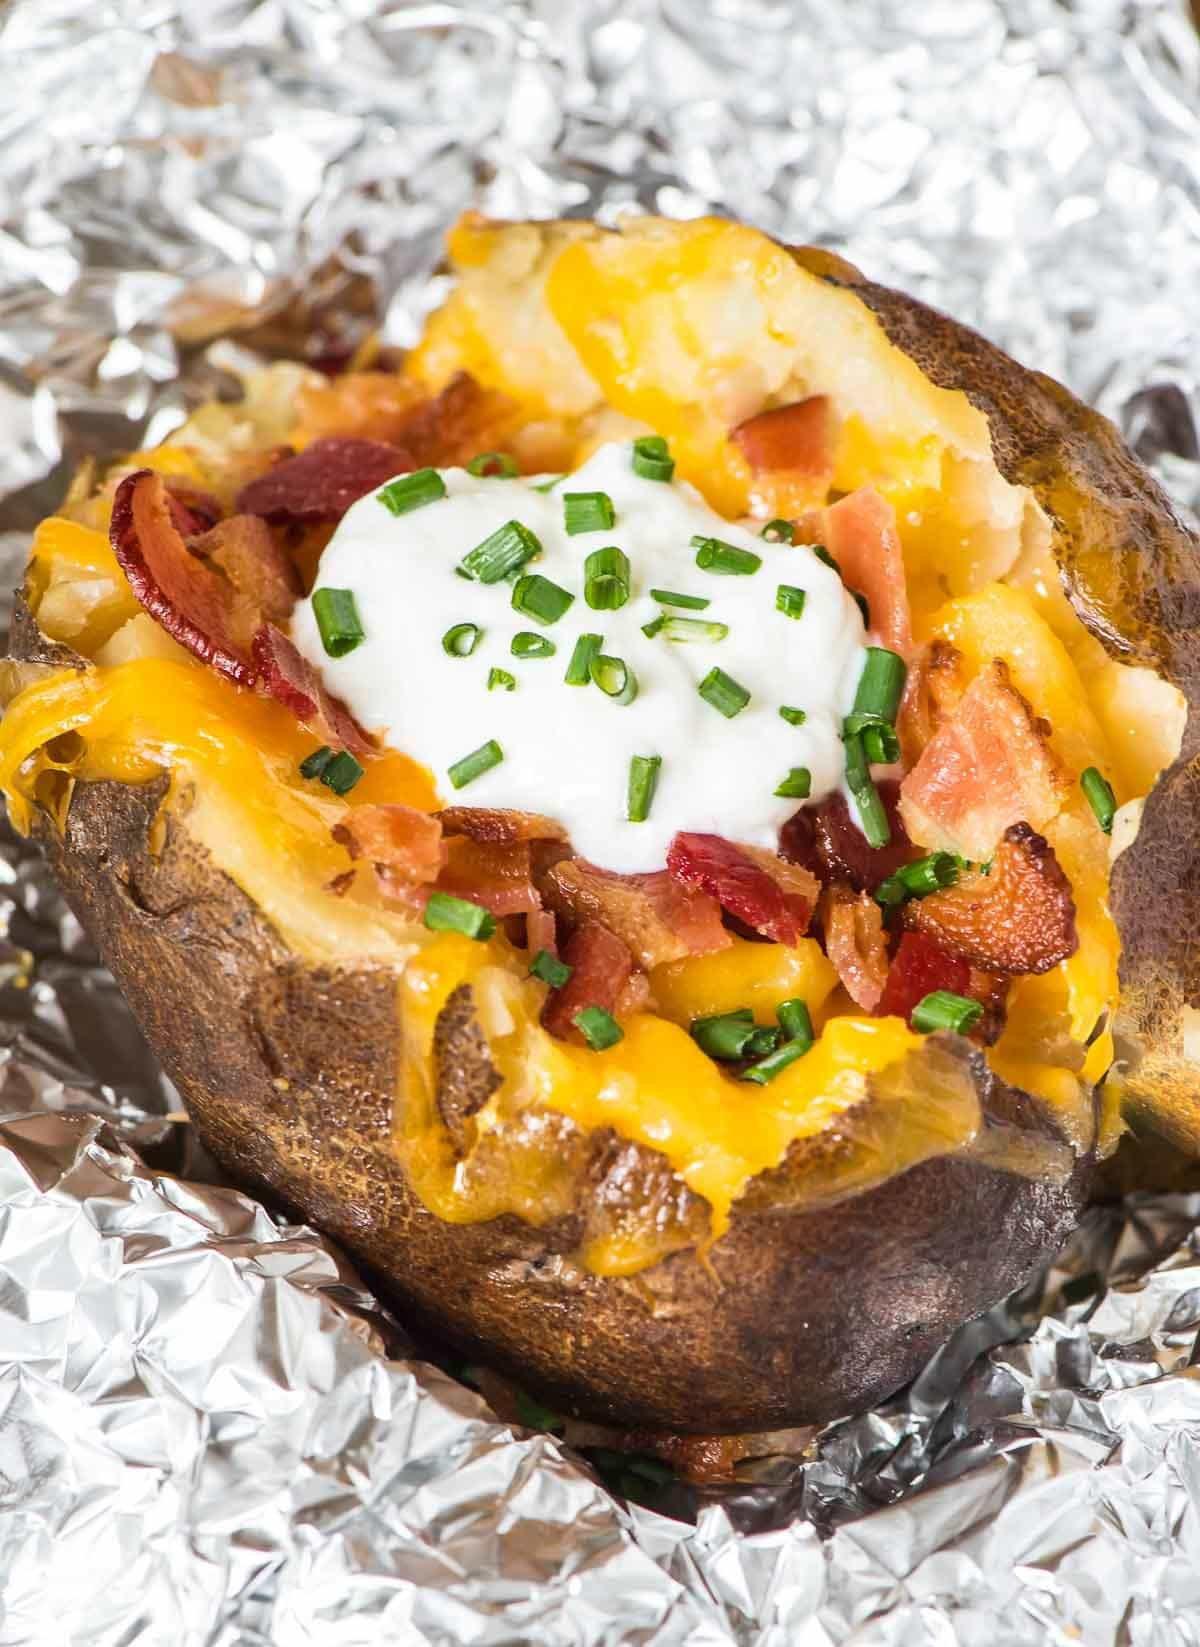 Baked Potato Recipe  How to Make Crock Pot Baked Potatoes